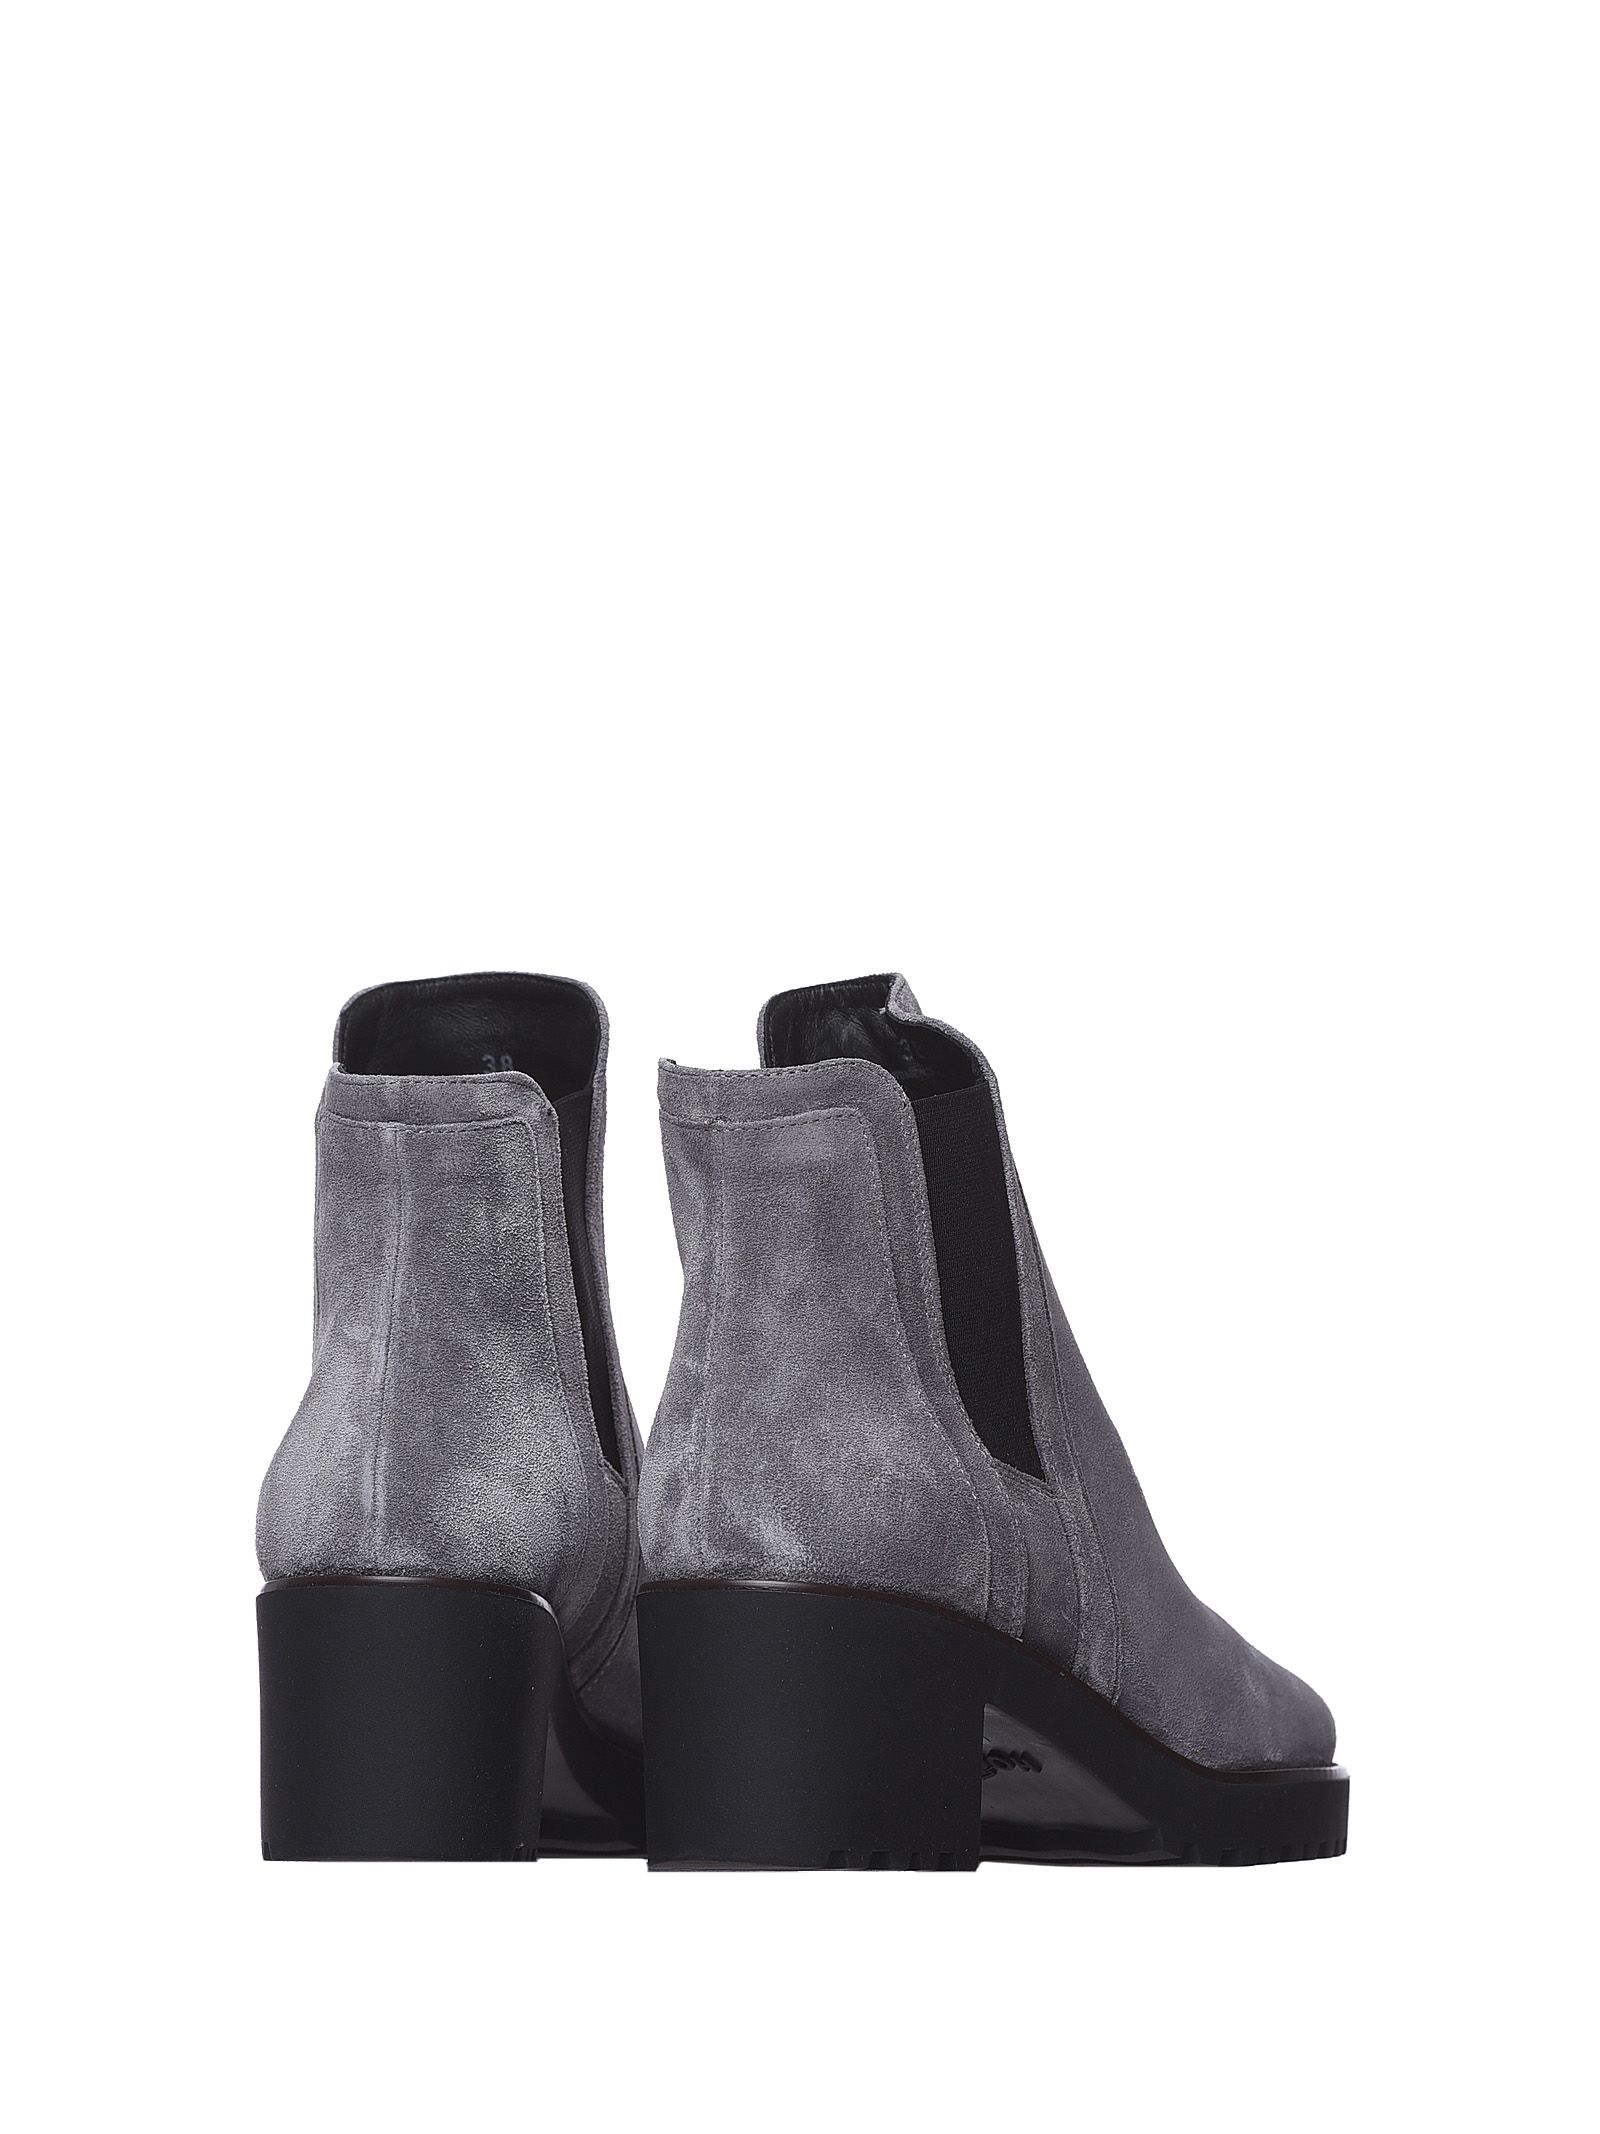 ... Hogan Ankle Boots H277 Grey